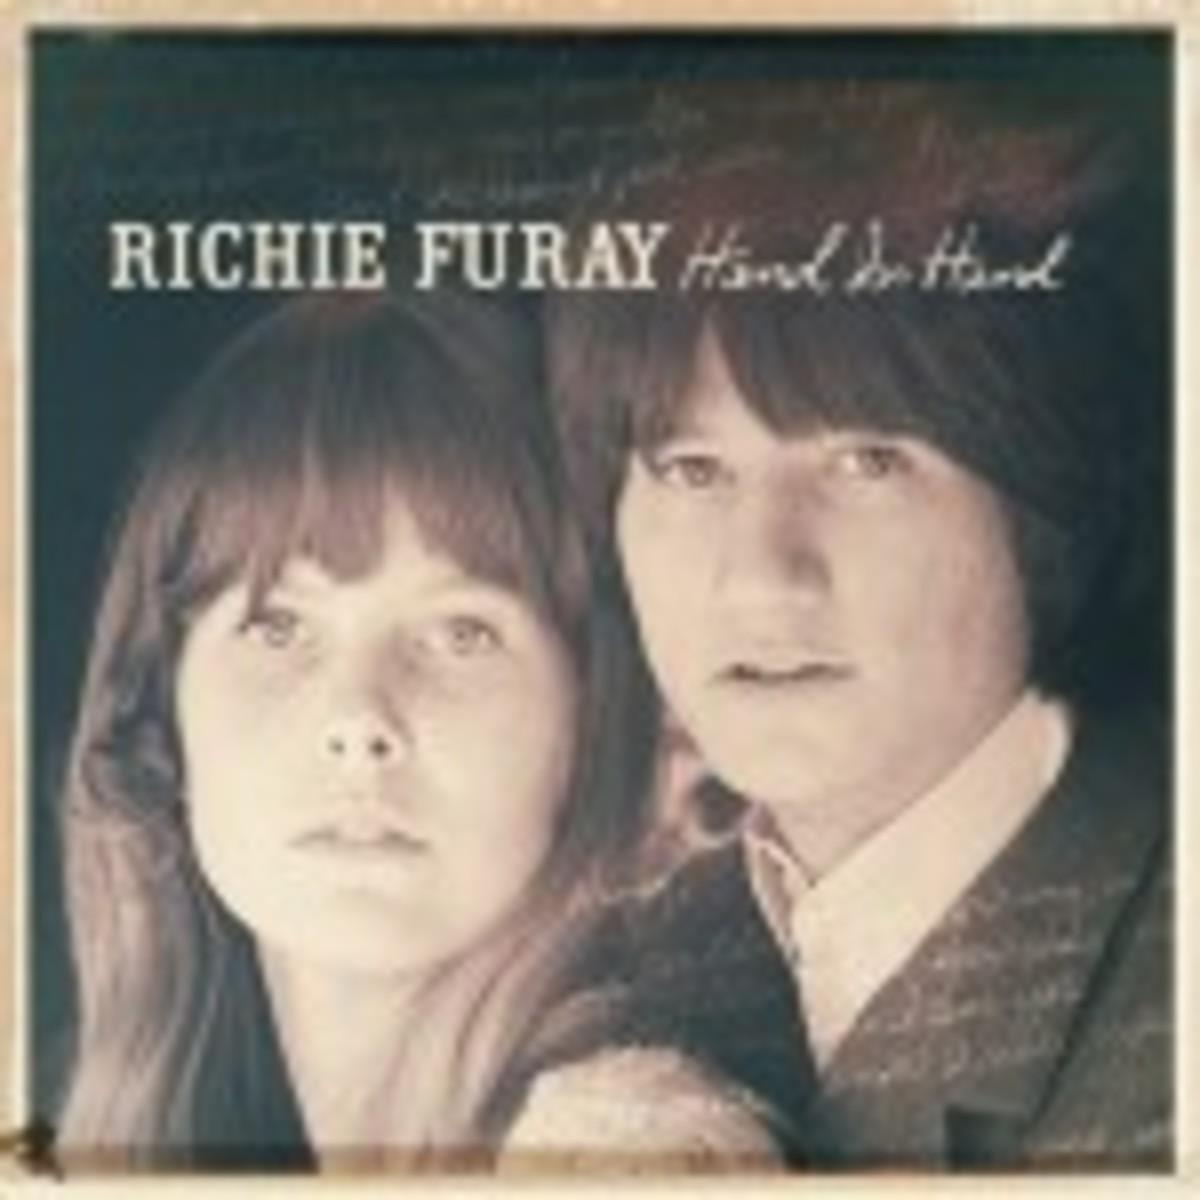 Richie-Furay-Hand-In-Hand